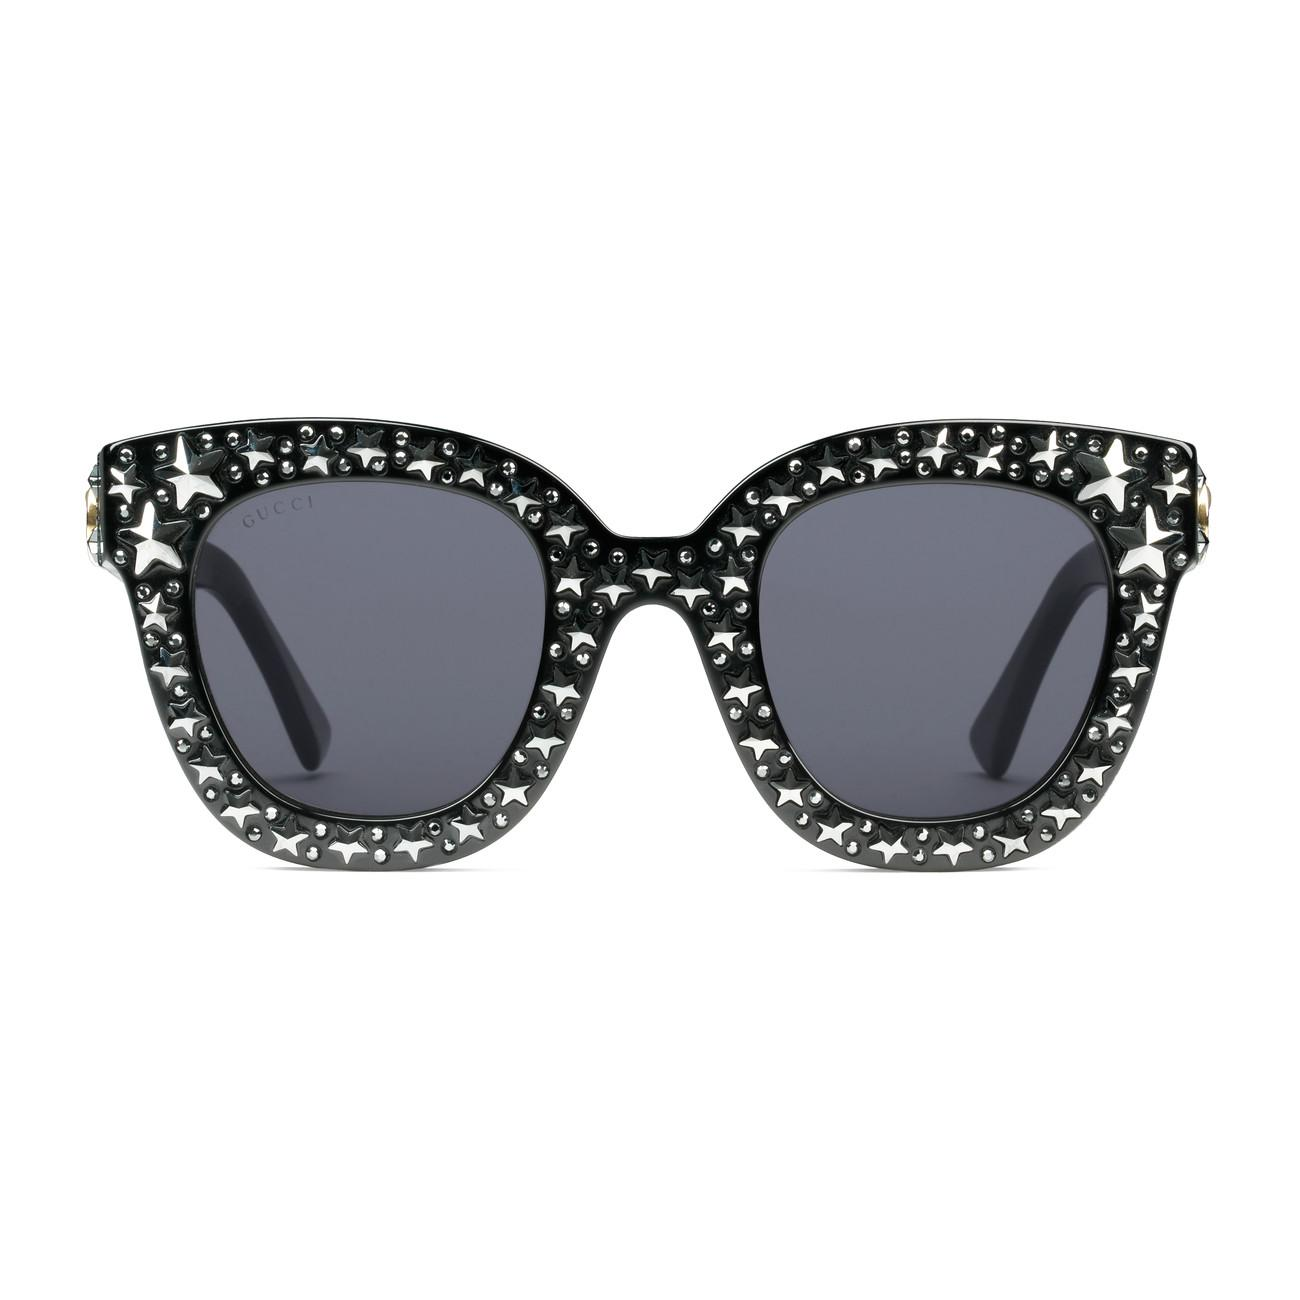 5c95e9928b050 Gucci - Black Cat Eye Acetate Sunglasses With Stars - Lyst. View fullscreen